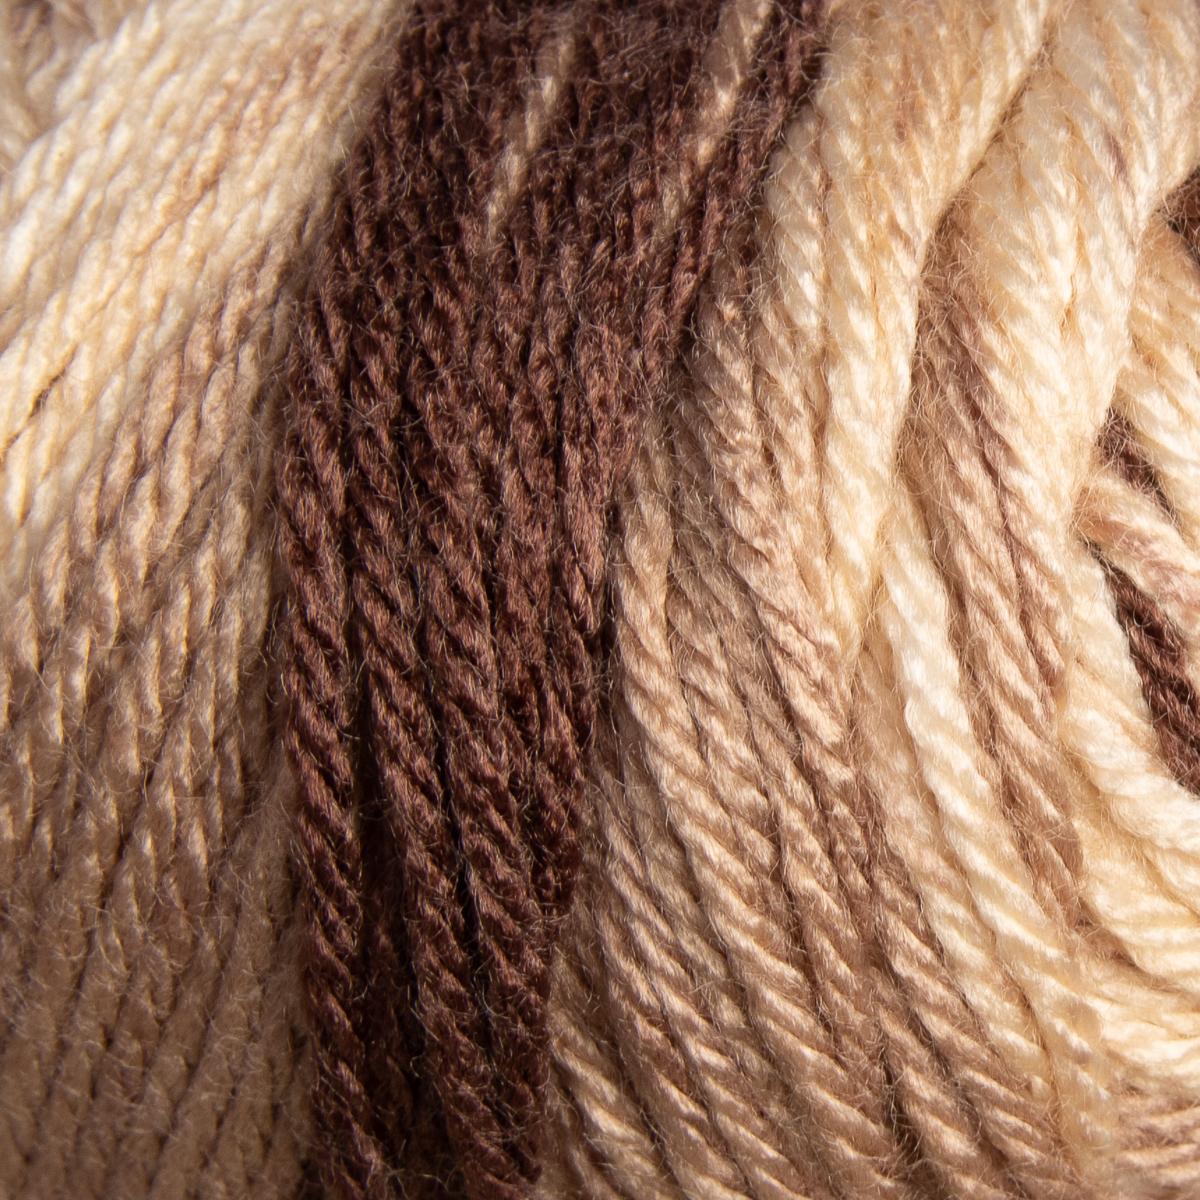 3pk-Caron-Simply-Soft-100-Acrylic-Yarn-Medium-4-Knitting-Crocheting-Skein-Soft thumbnail 13